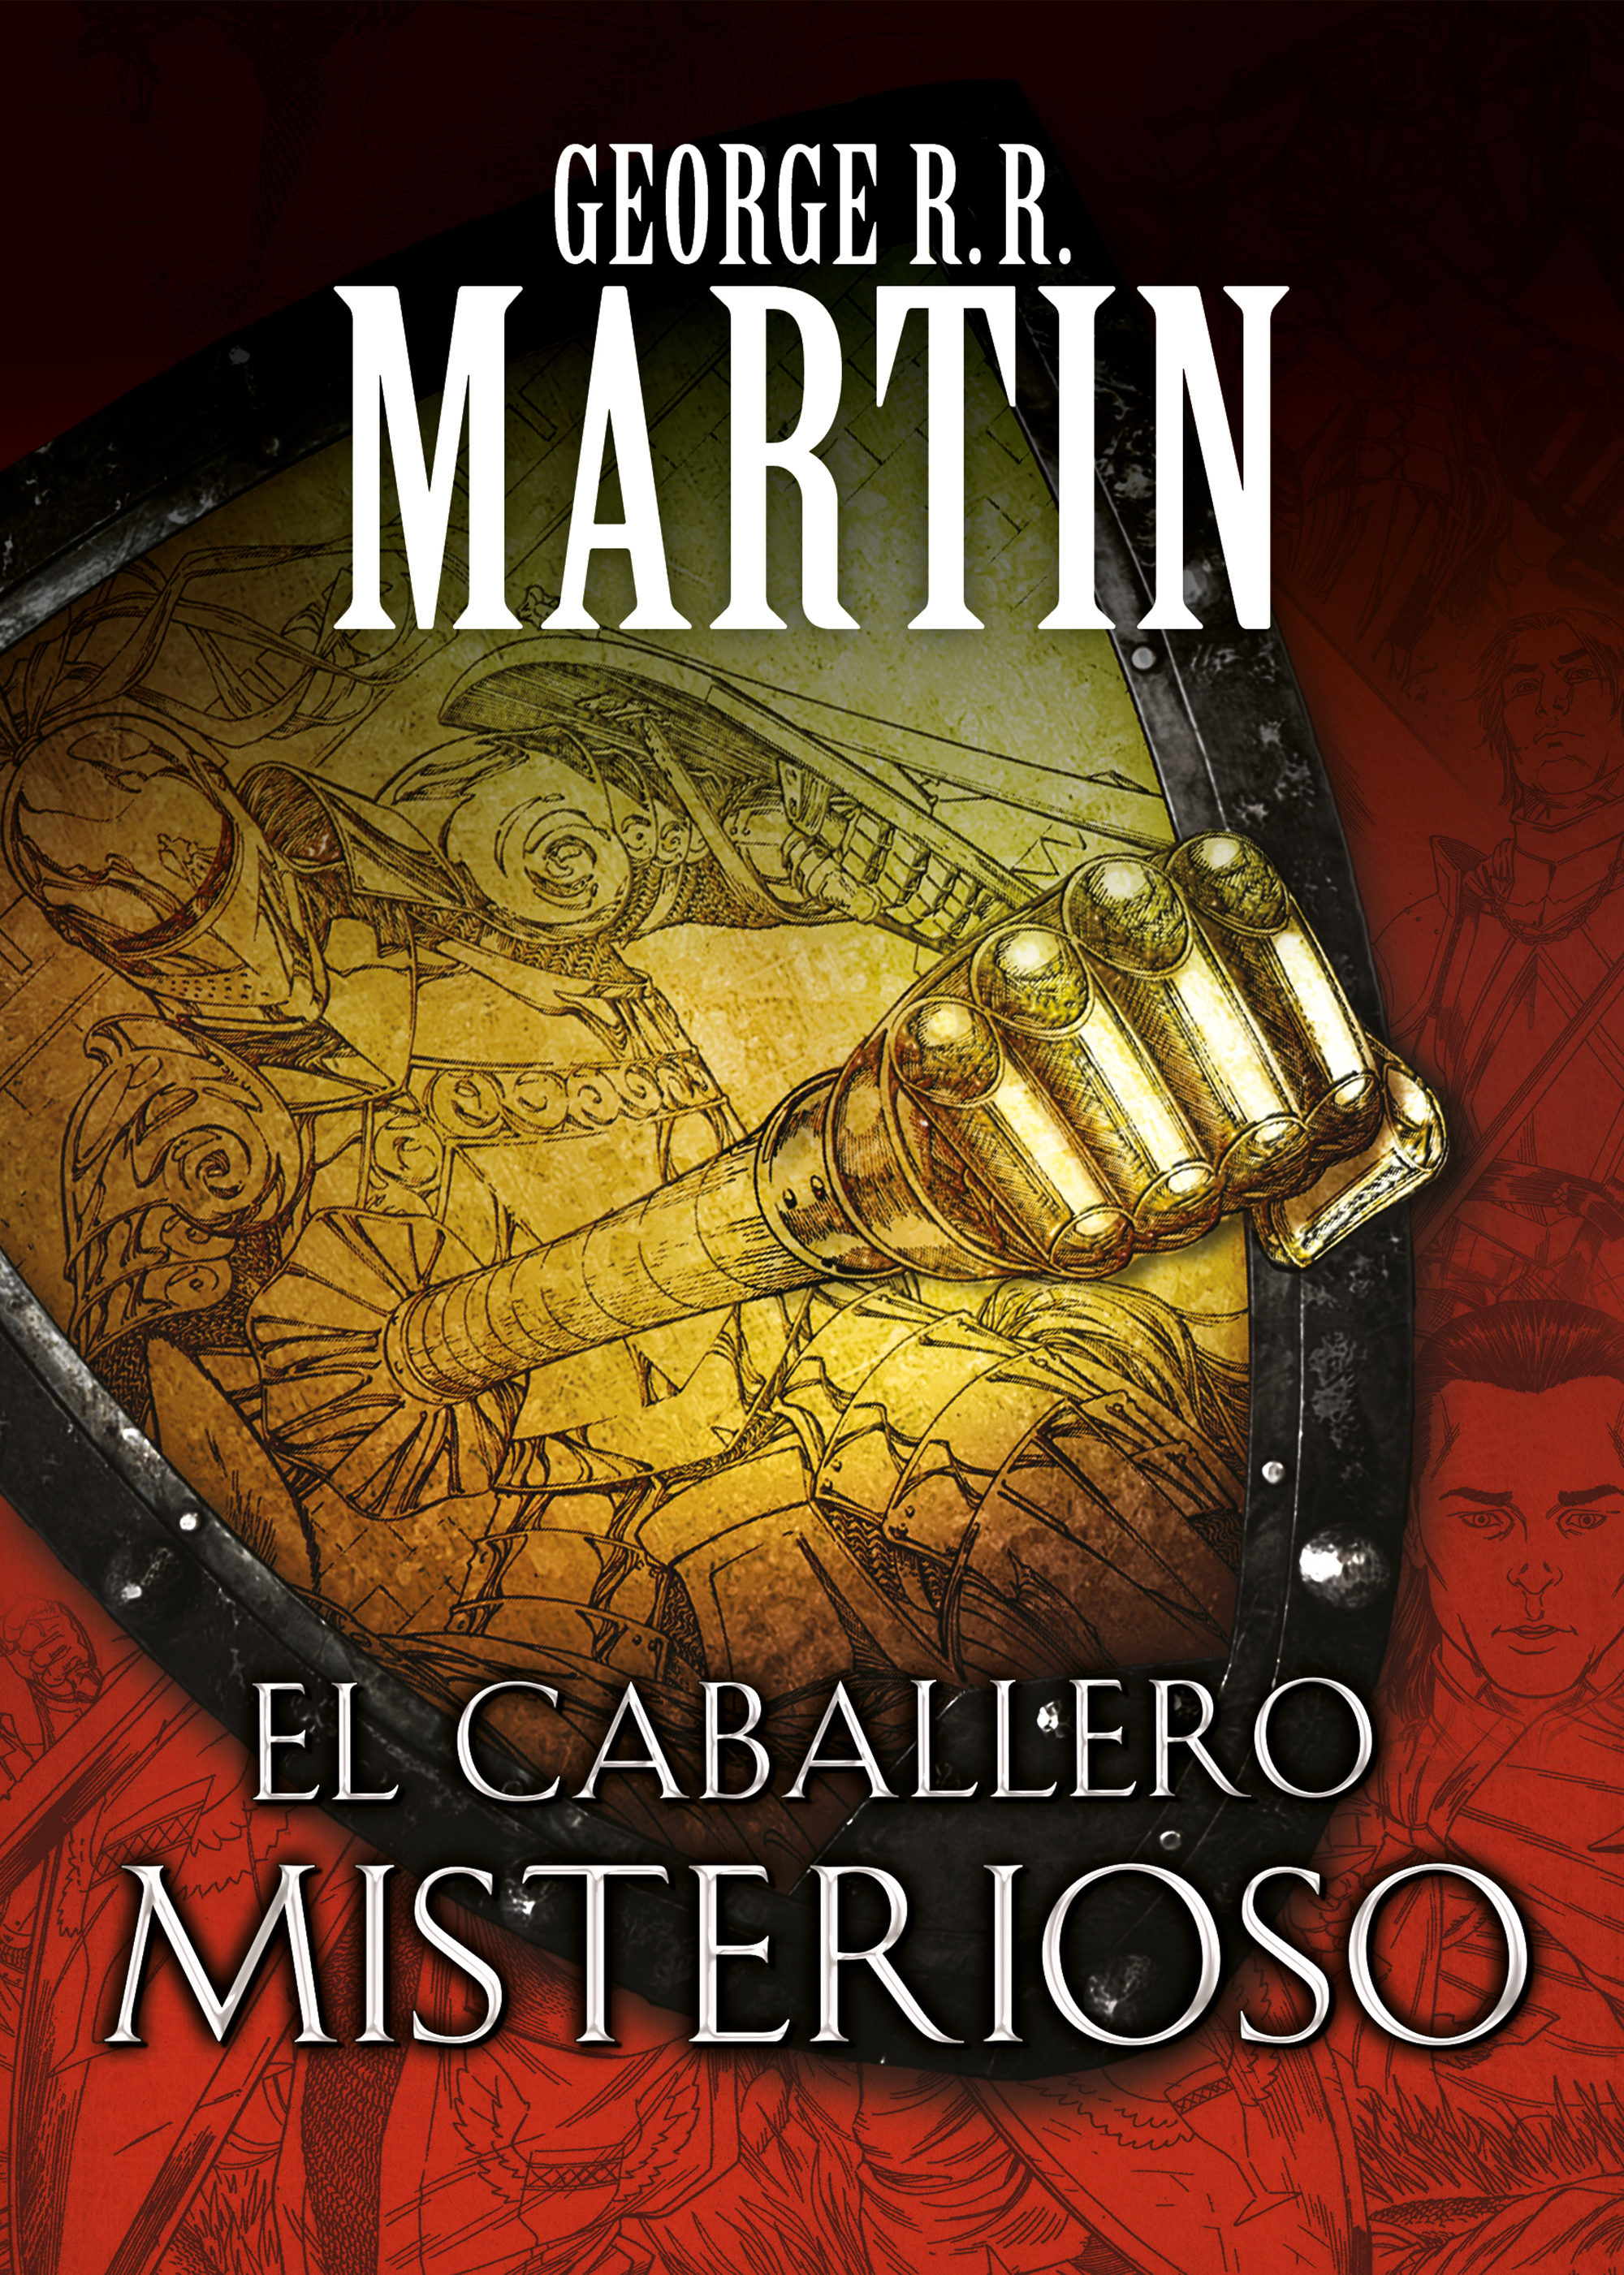 El Caballero Misterioso - George R.R. Martin - Debolsillo